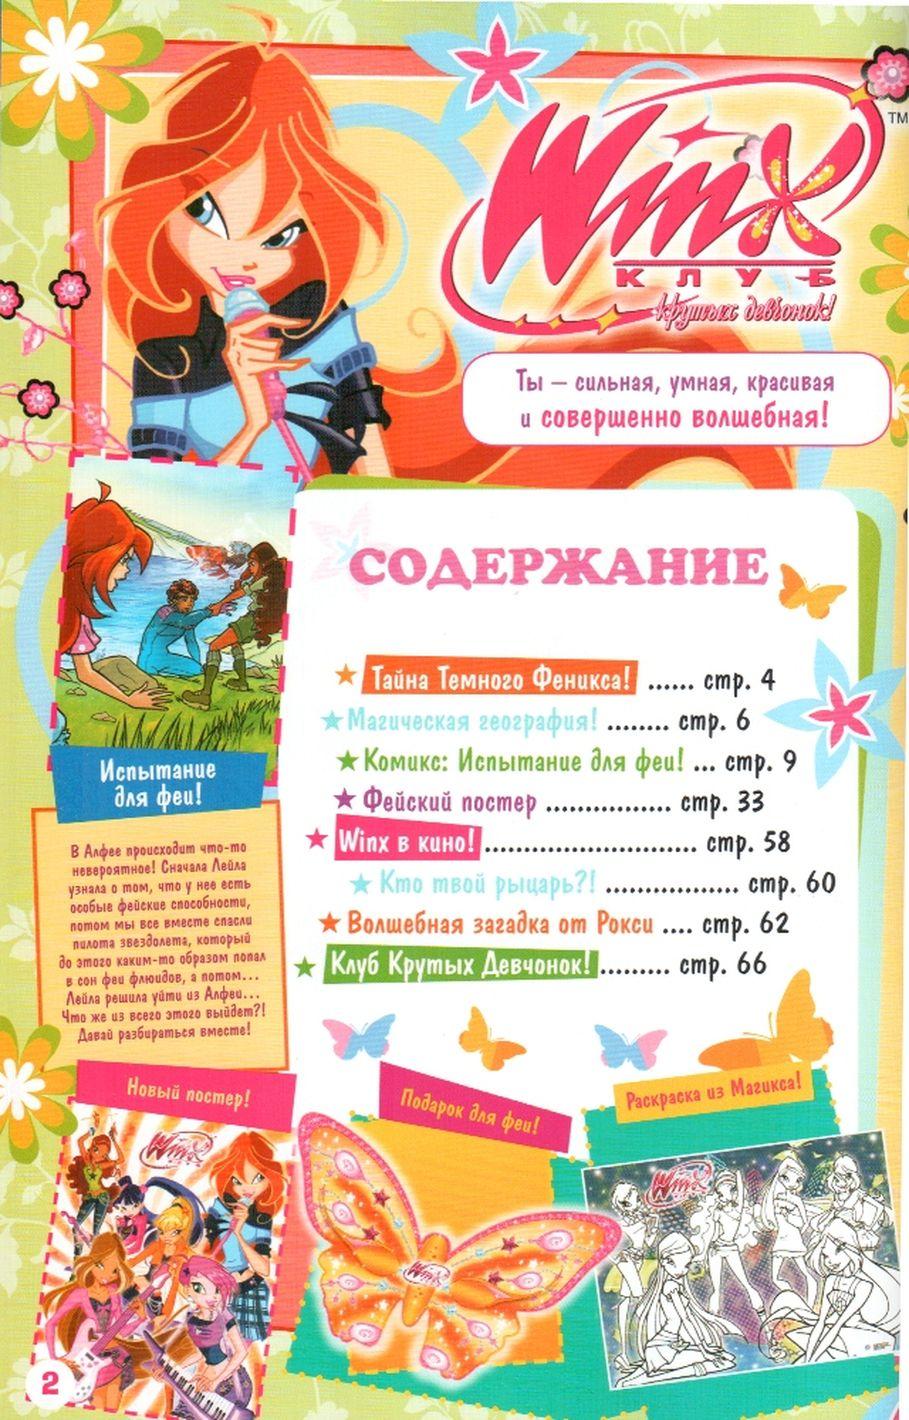 Комикс Винкс Winx - Испытания для феи! (Журнал Винкс №11 2010)